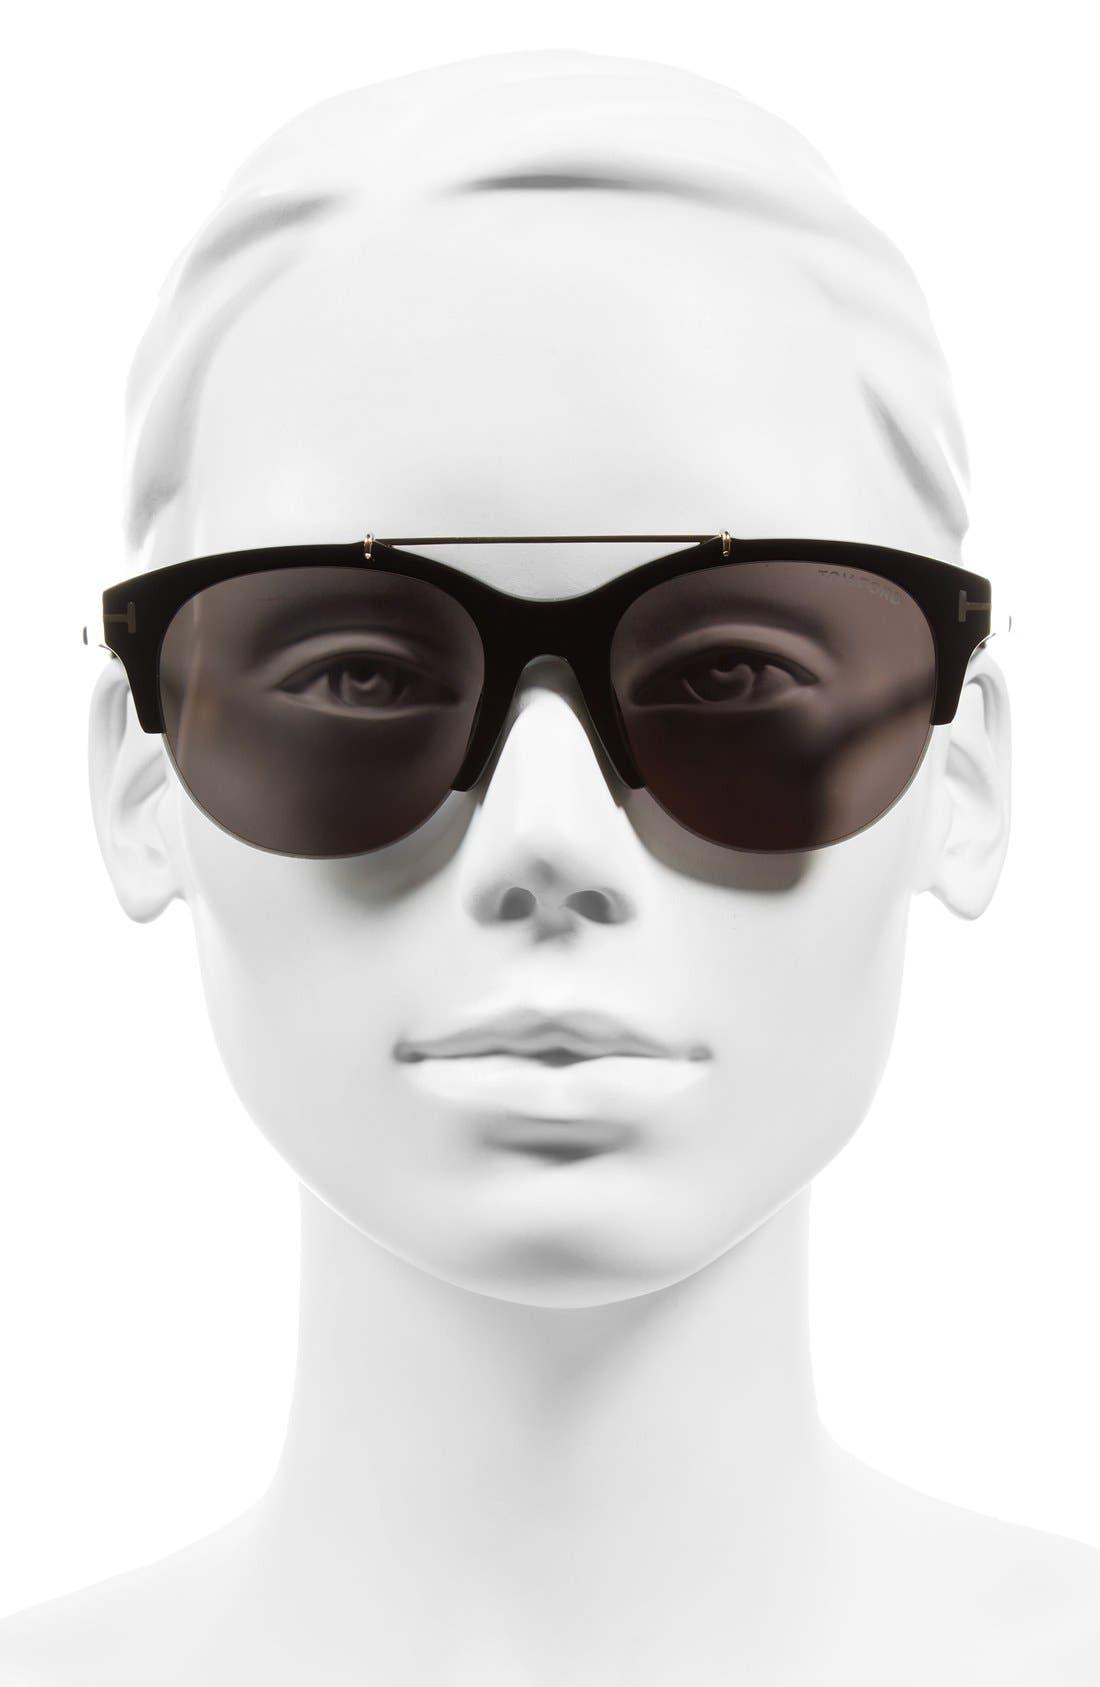 Adrenne 55mm Sunglasses,                             Alternate thumbnail 2, color,                             Black/ Rose Gold/ Smoke